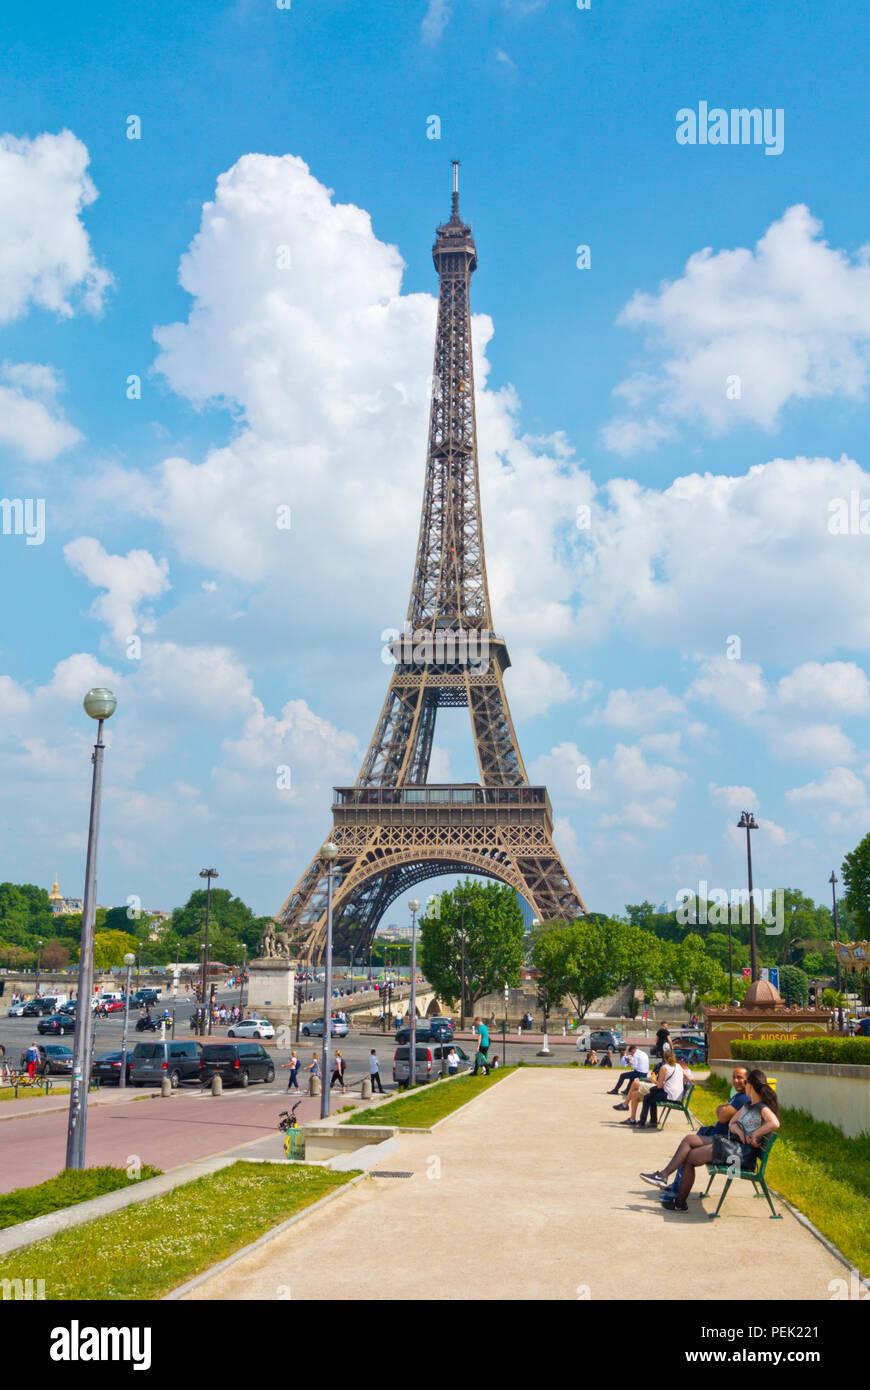 Eiffel tower, seen from Trocadero, Paris, France - Stock Image